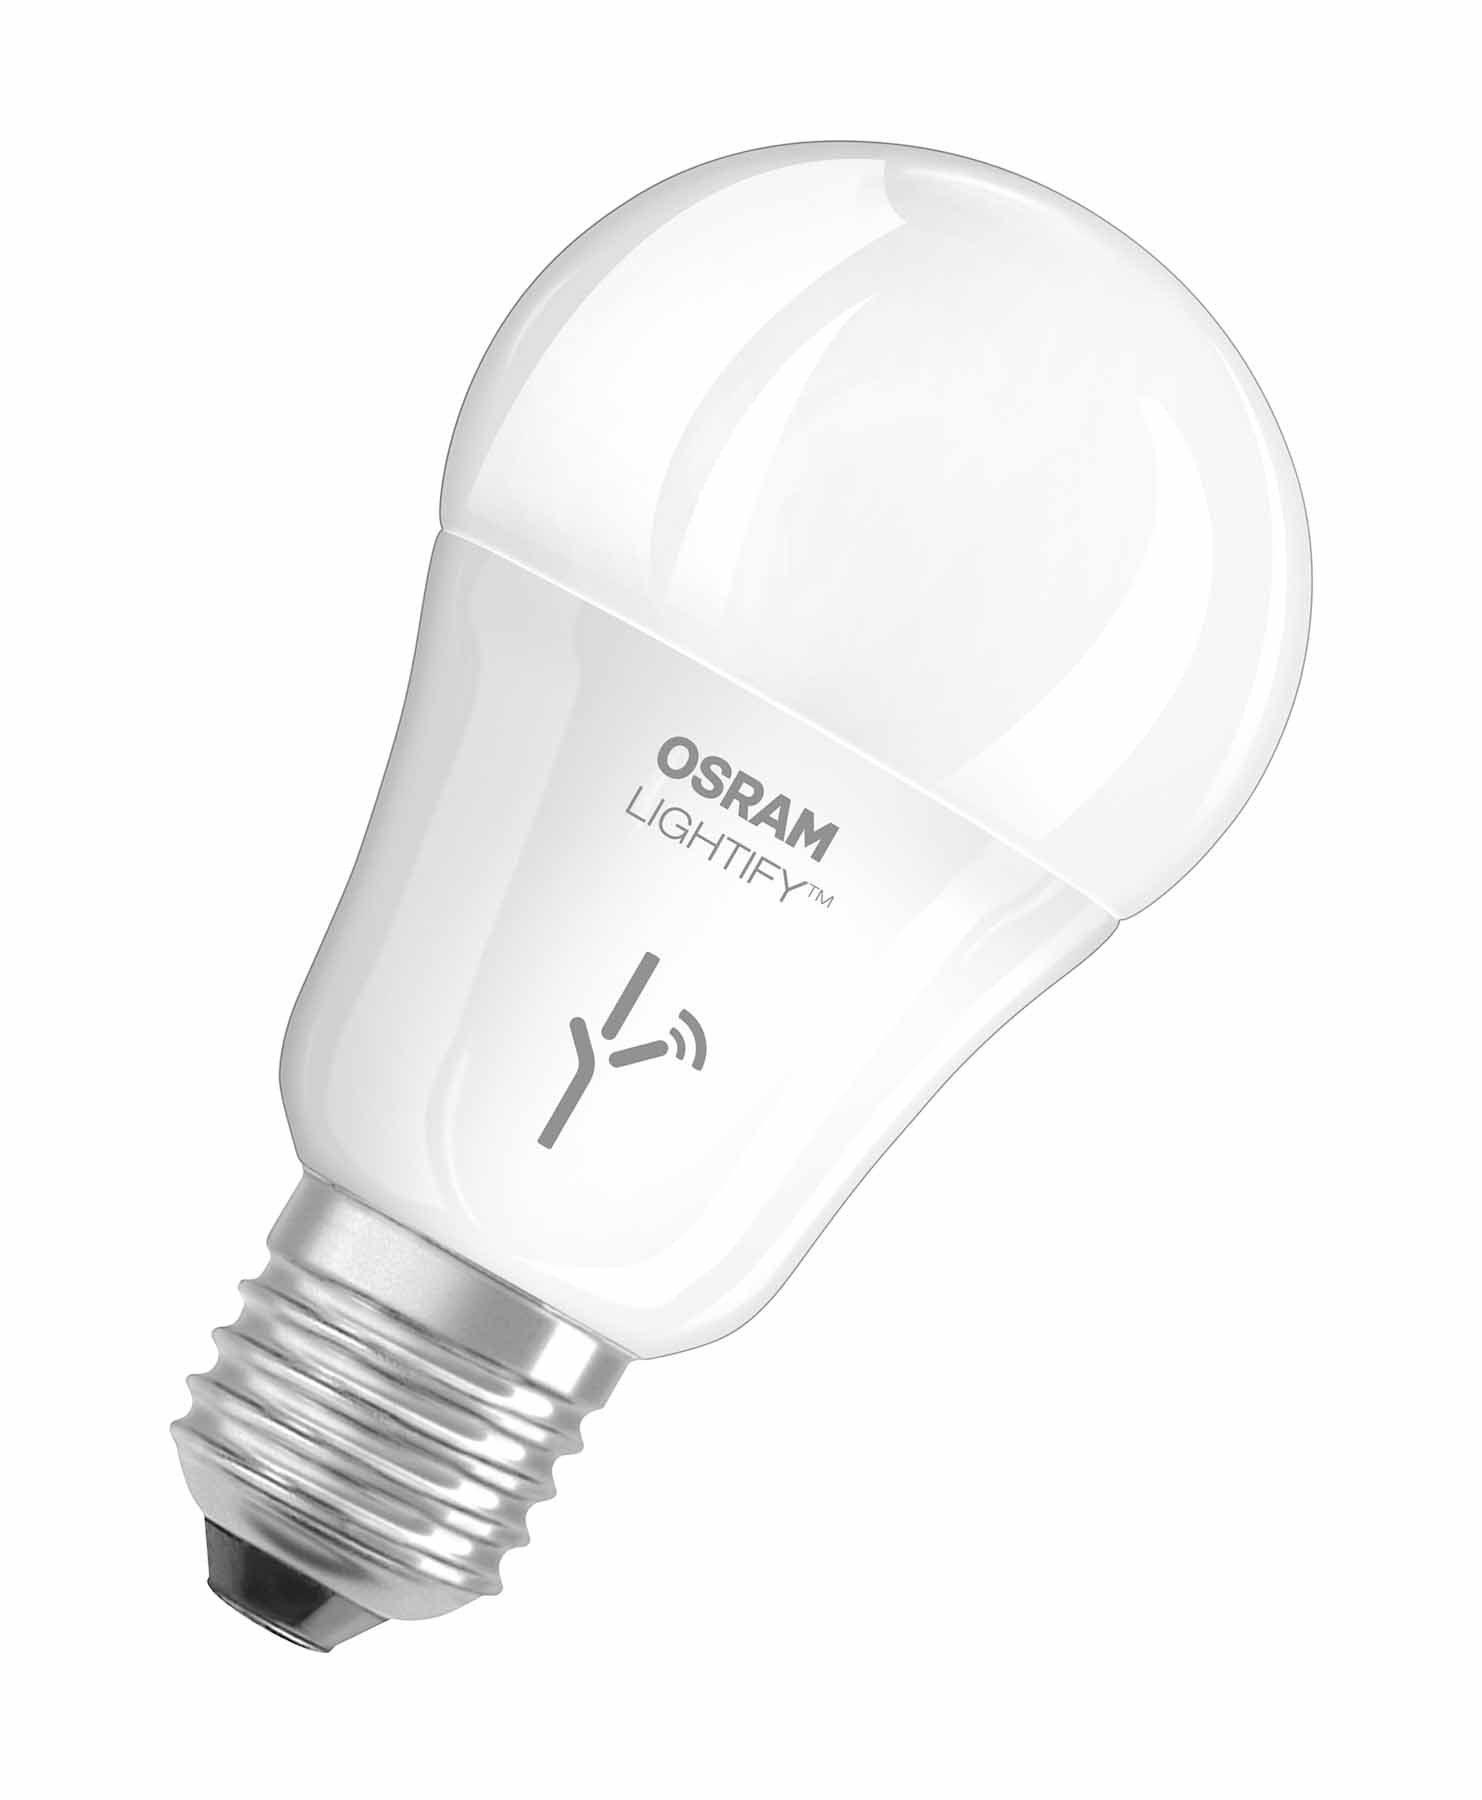 Osram Lightify Smart Home - CLASSIC A 60 WHITE »CLA 60 / 10W LED-Retrofit-Lampen«